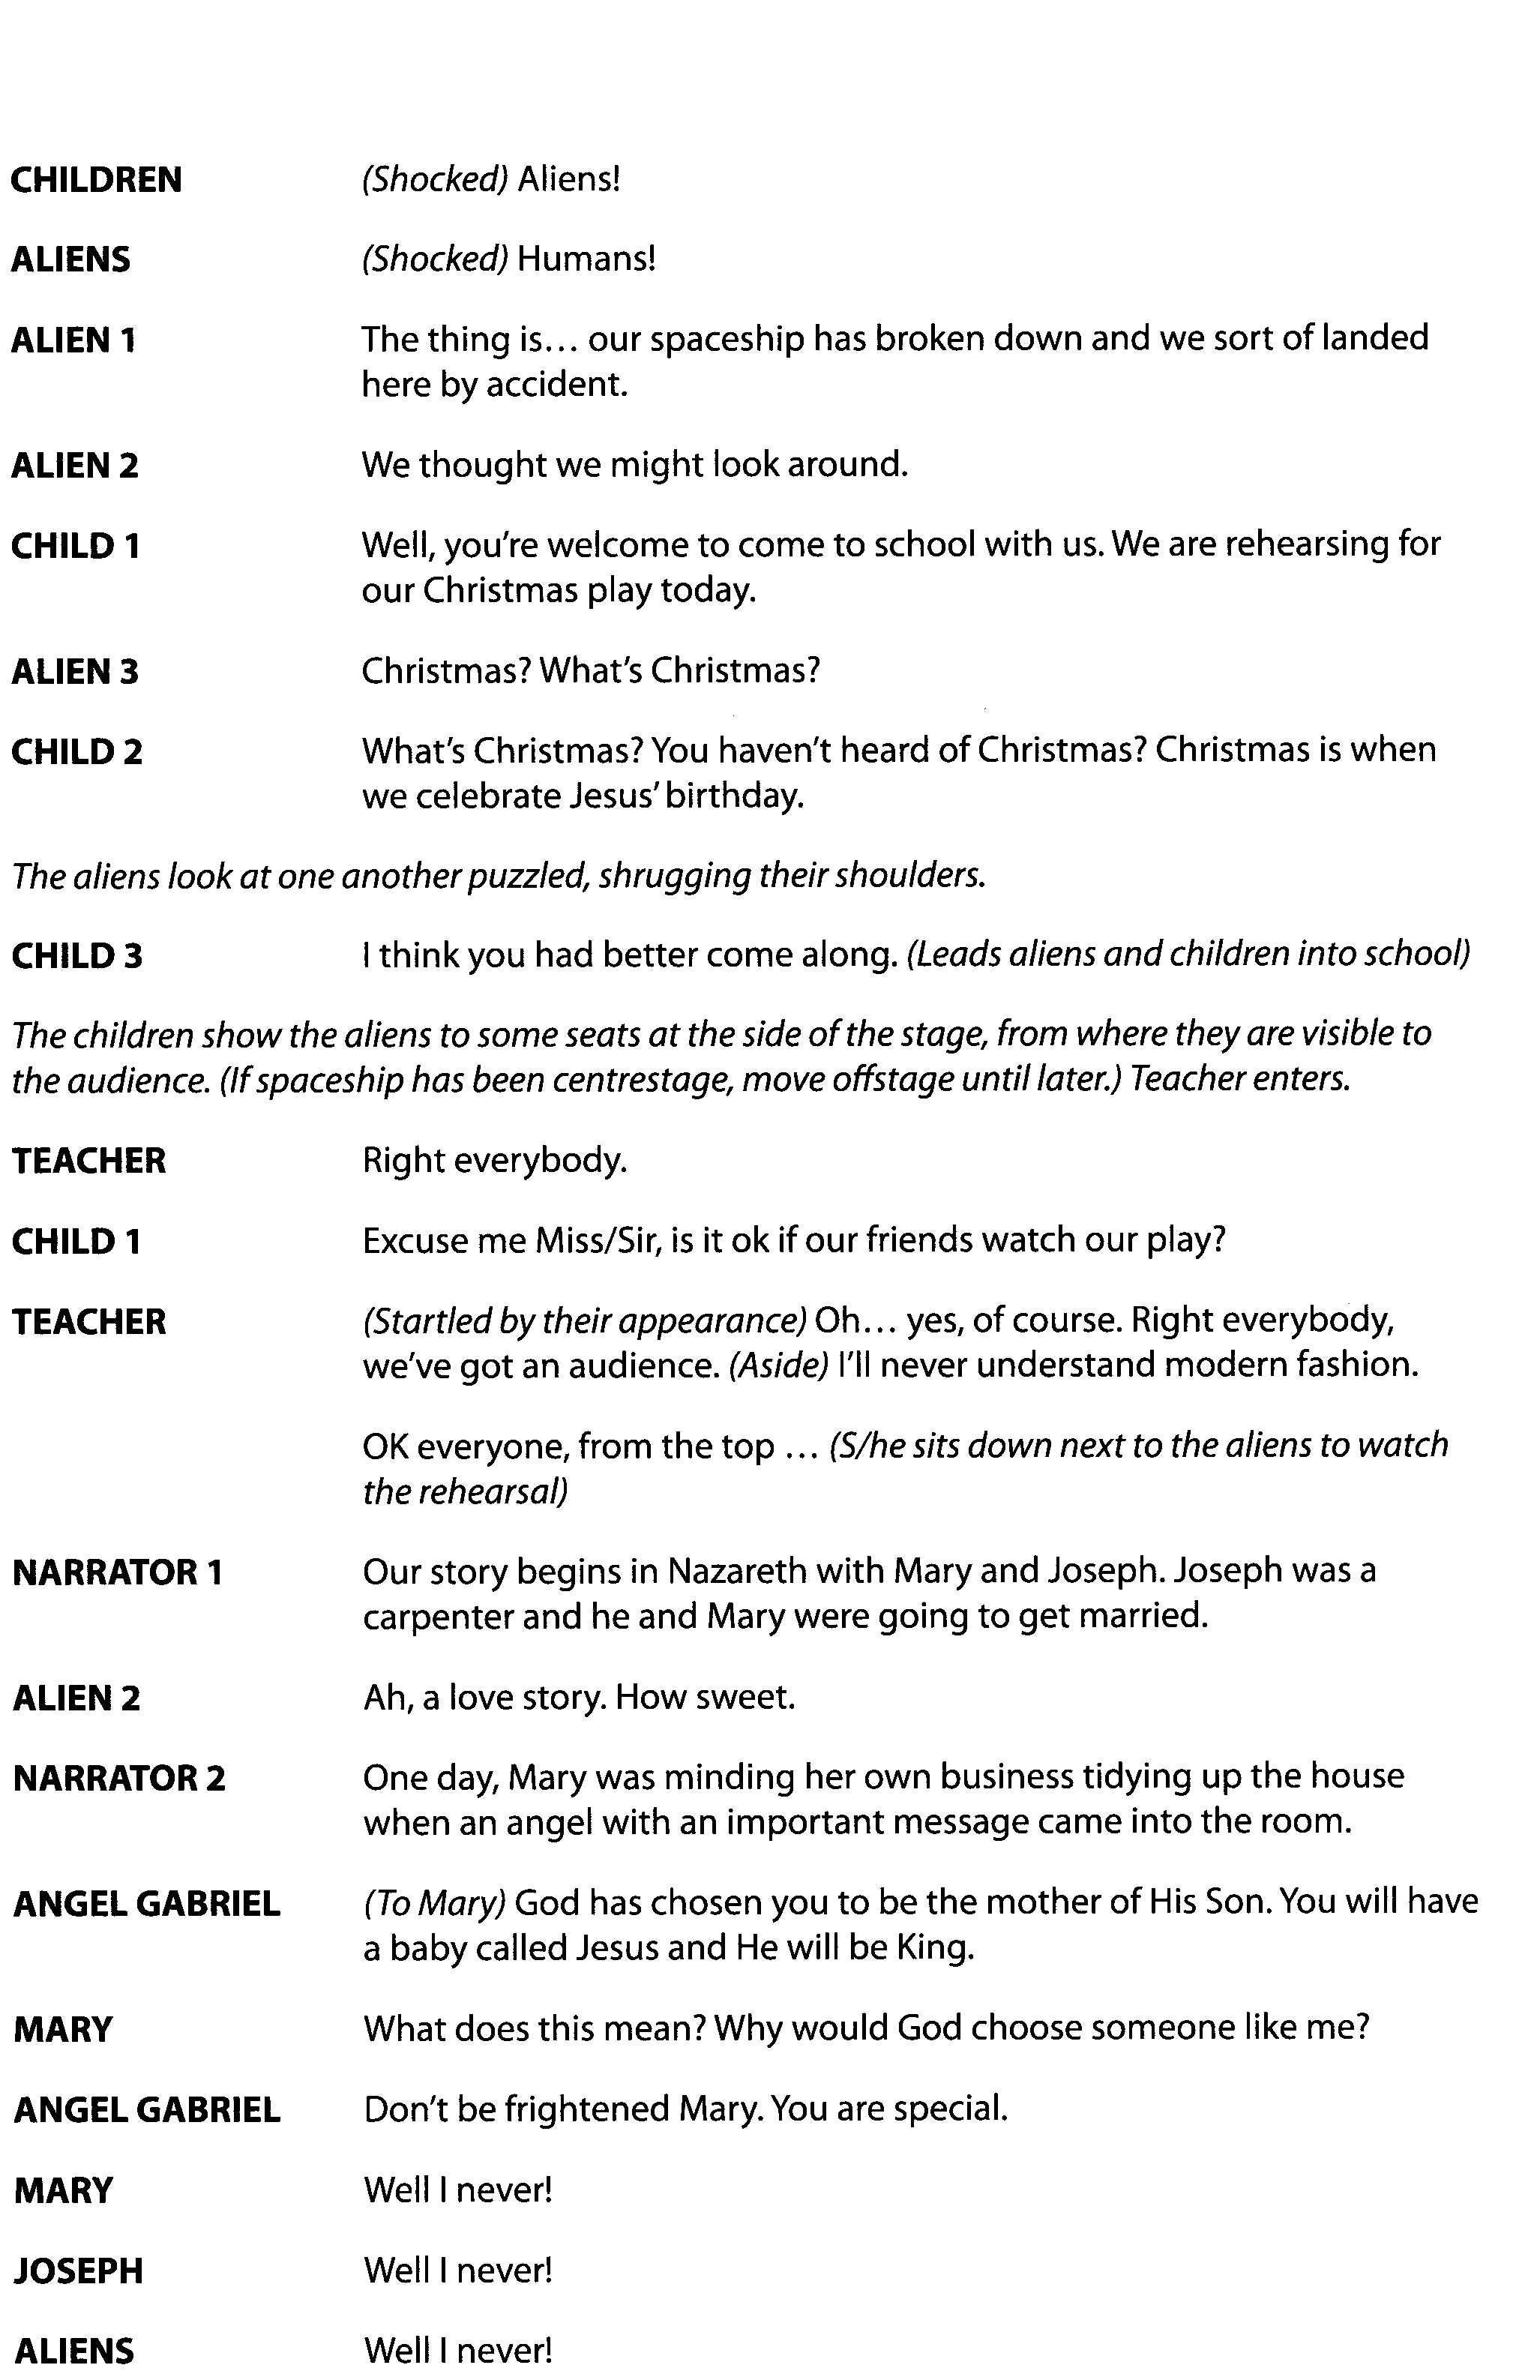 Free Printable Christmas Plays Church – Festival Collections - Free Printable Christmas Plays Church